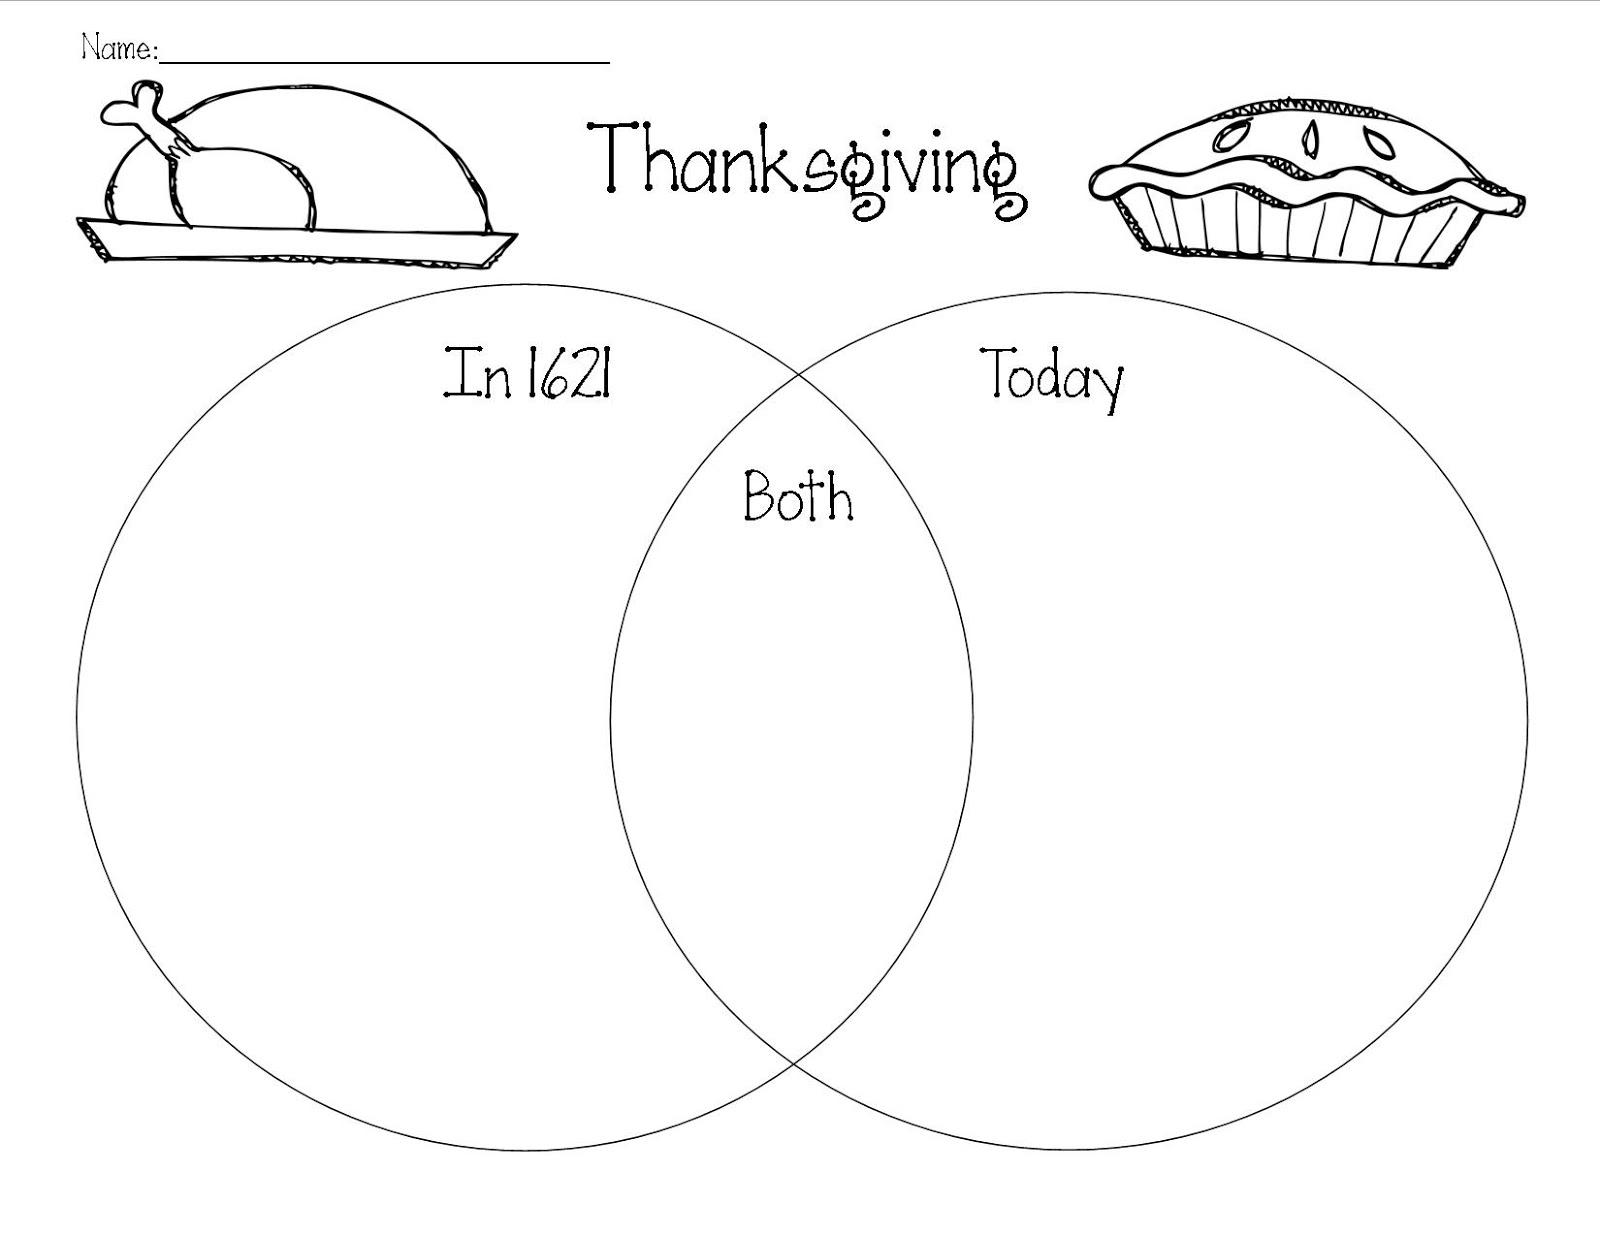 teacher and a mom thanksgiving compare and contrast 1st grade venn diagram thanksgiving venn diagram cut and paste [ 1600 x 1236 Pixel ]